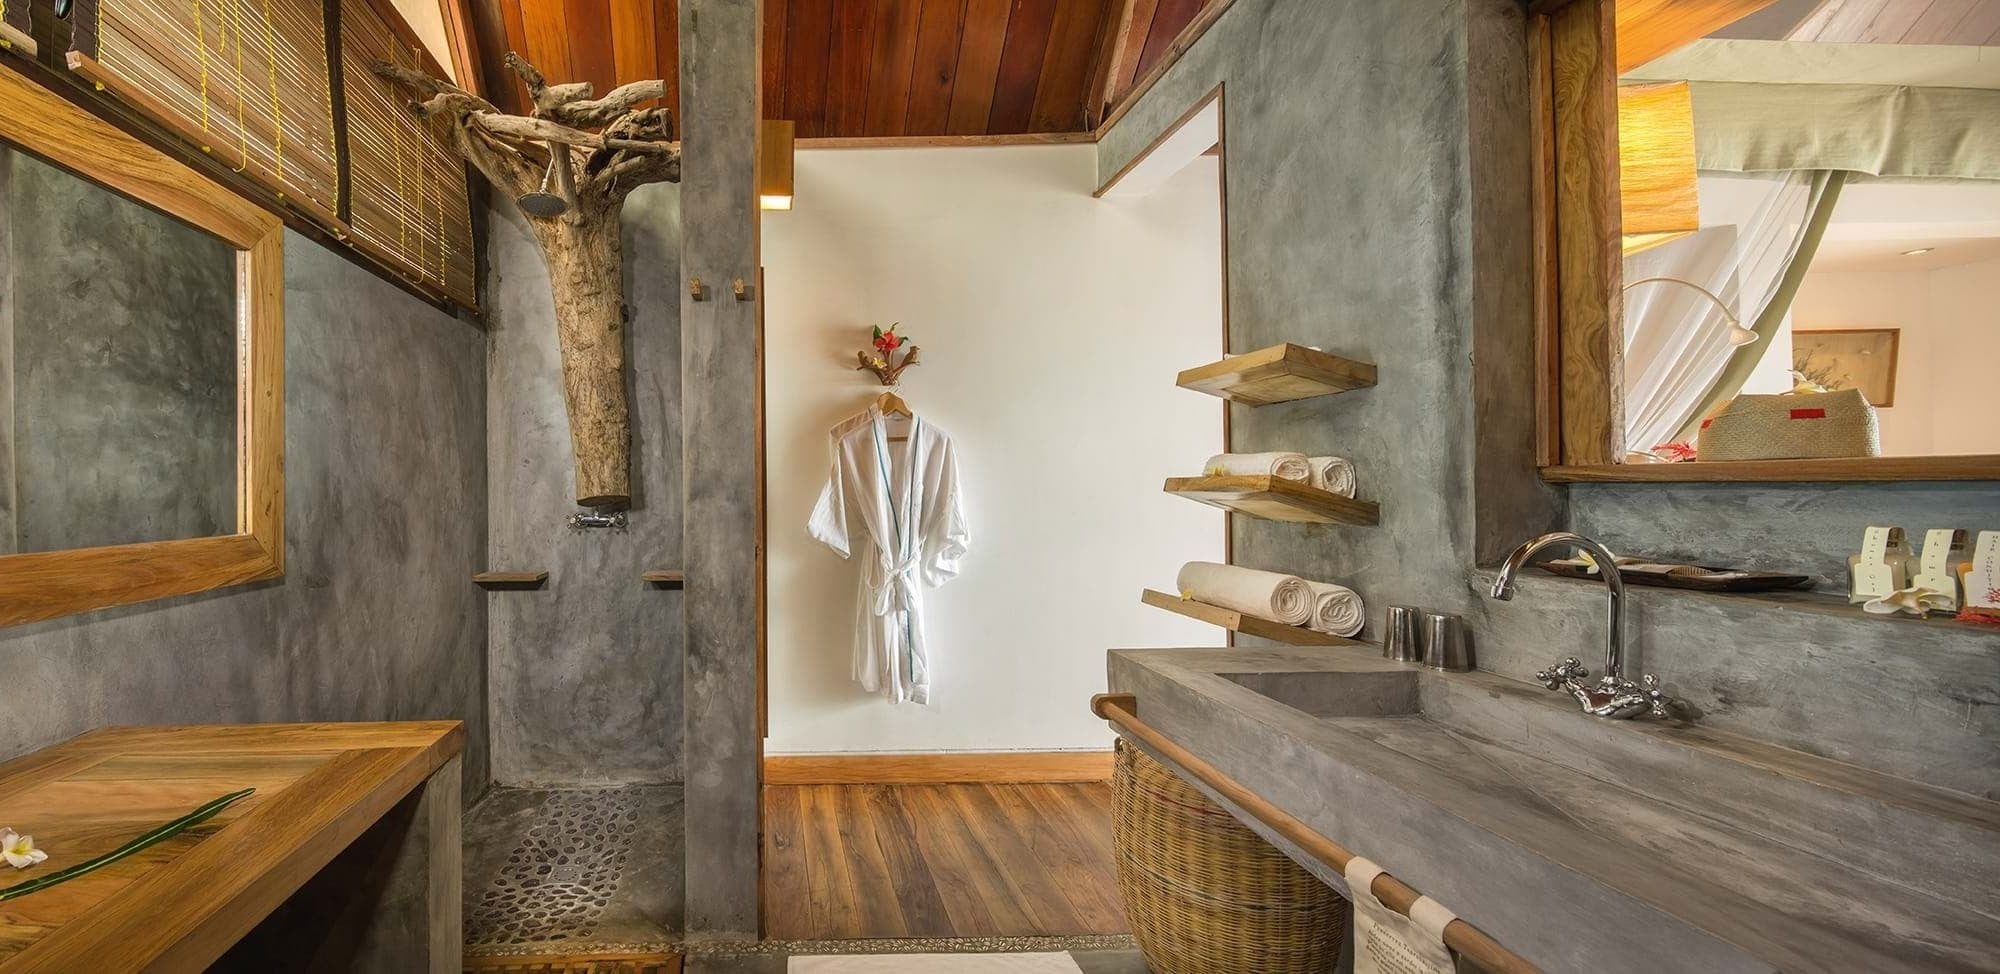 Tsarabanjina Nosy Be Madagascar Bathroom